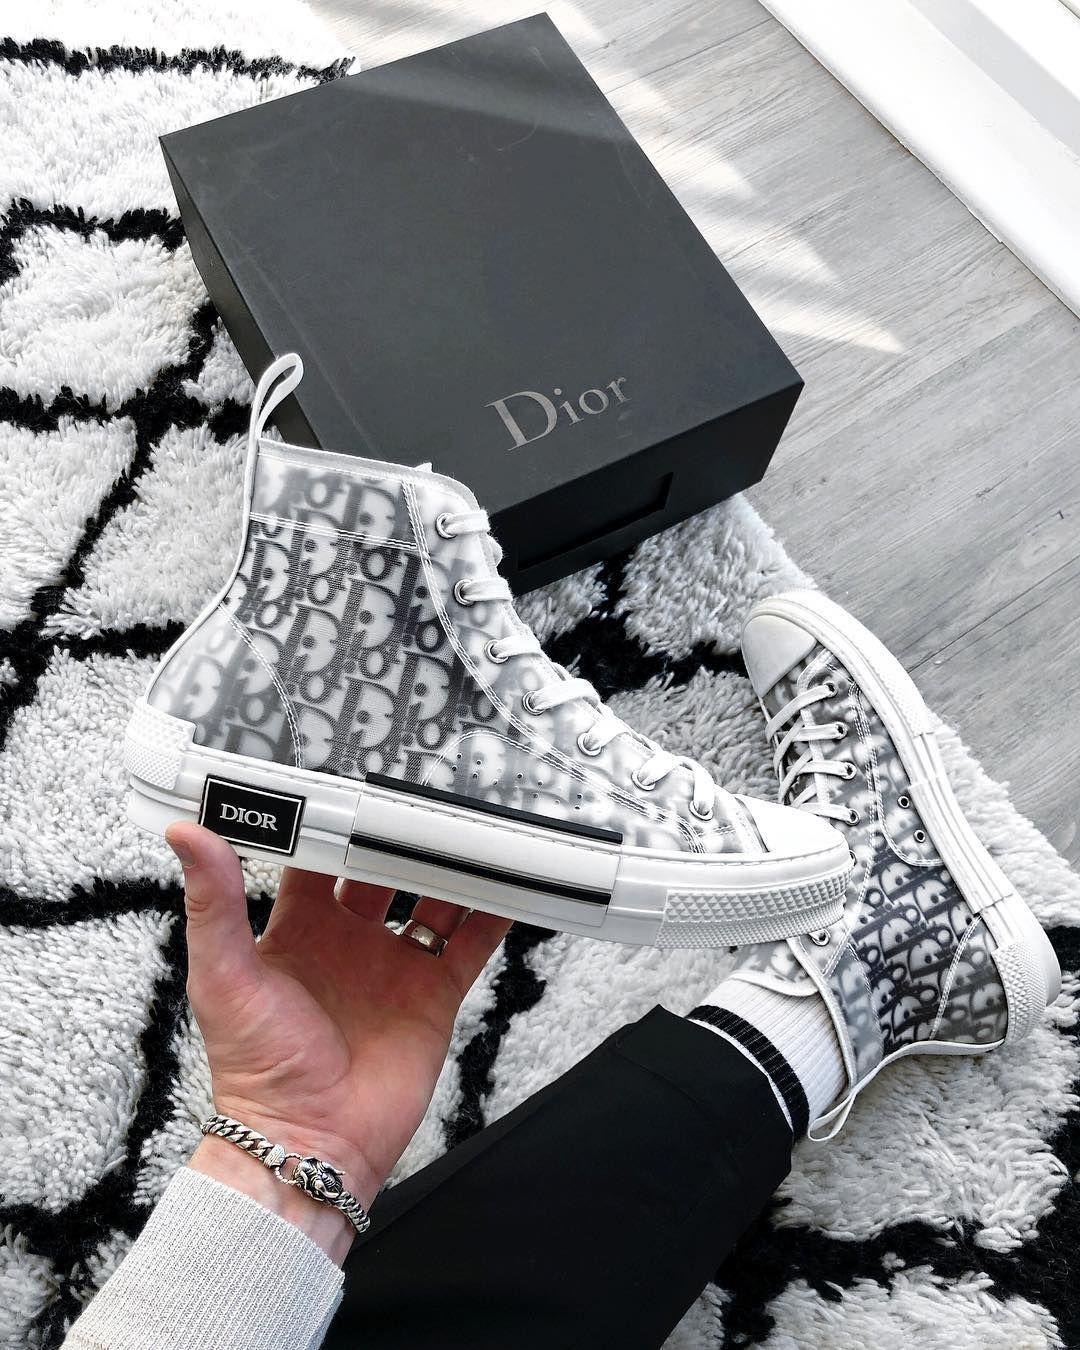 "qualité-supérieure taille 40 chaussures de course 𝕵𝖔𝖊𝖑 on Instagram: ""@dior ✨ sneaker unboxing video now ..."